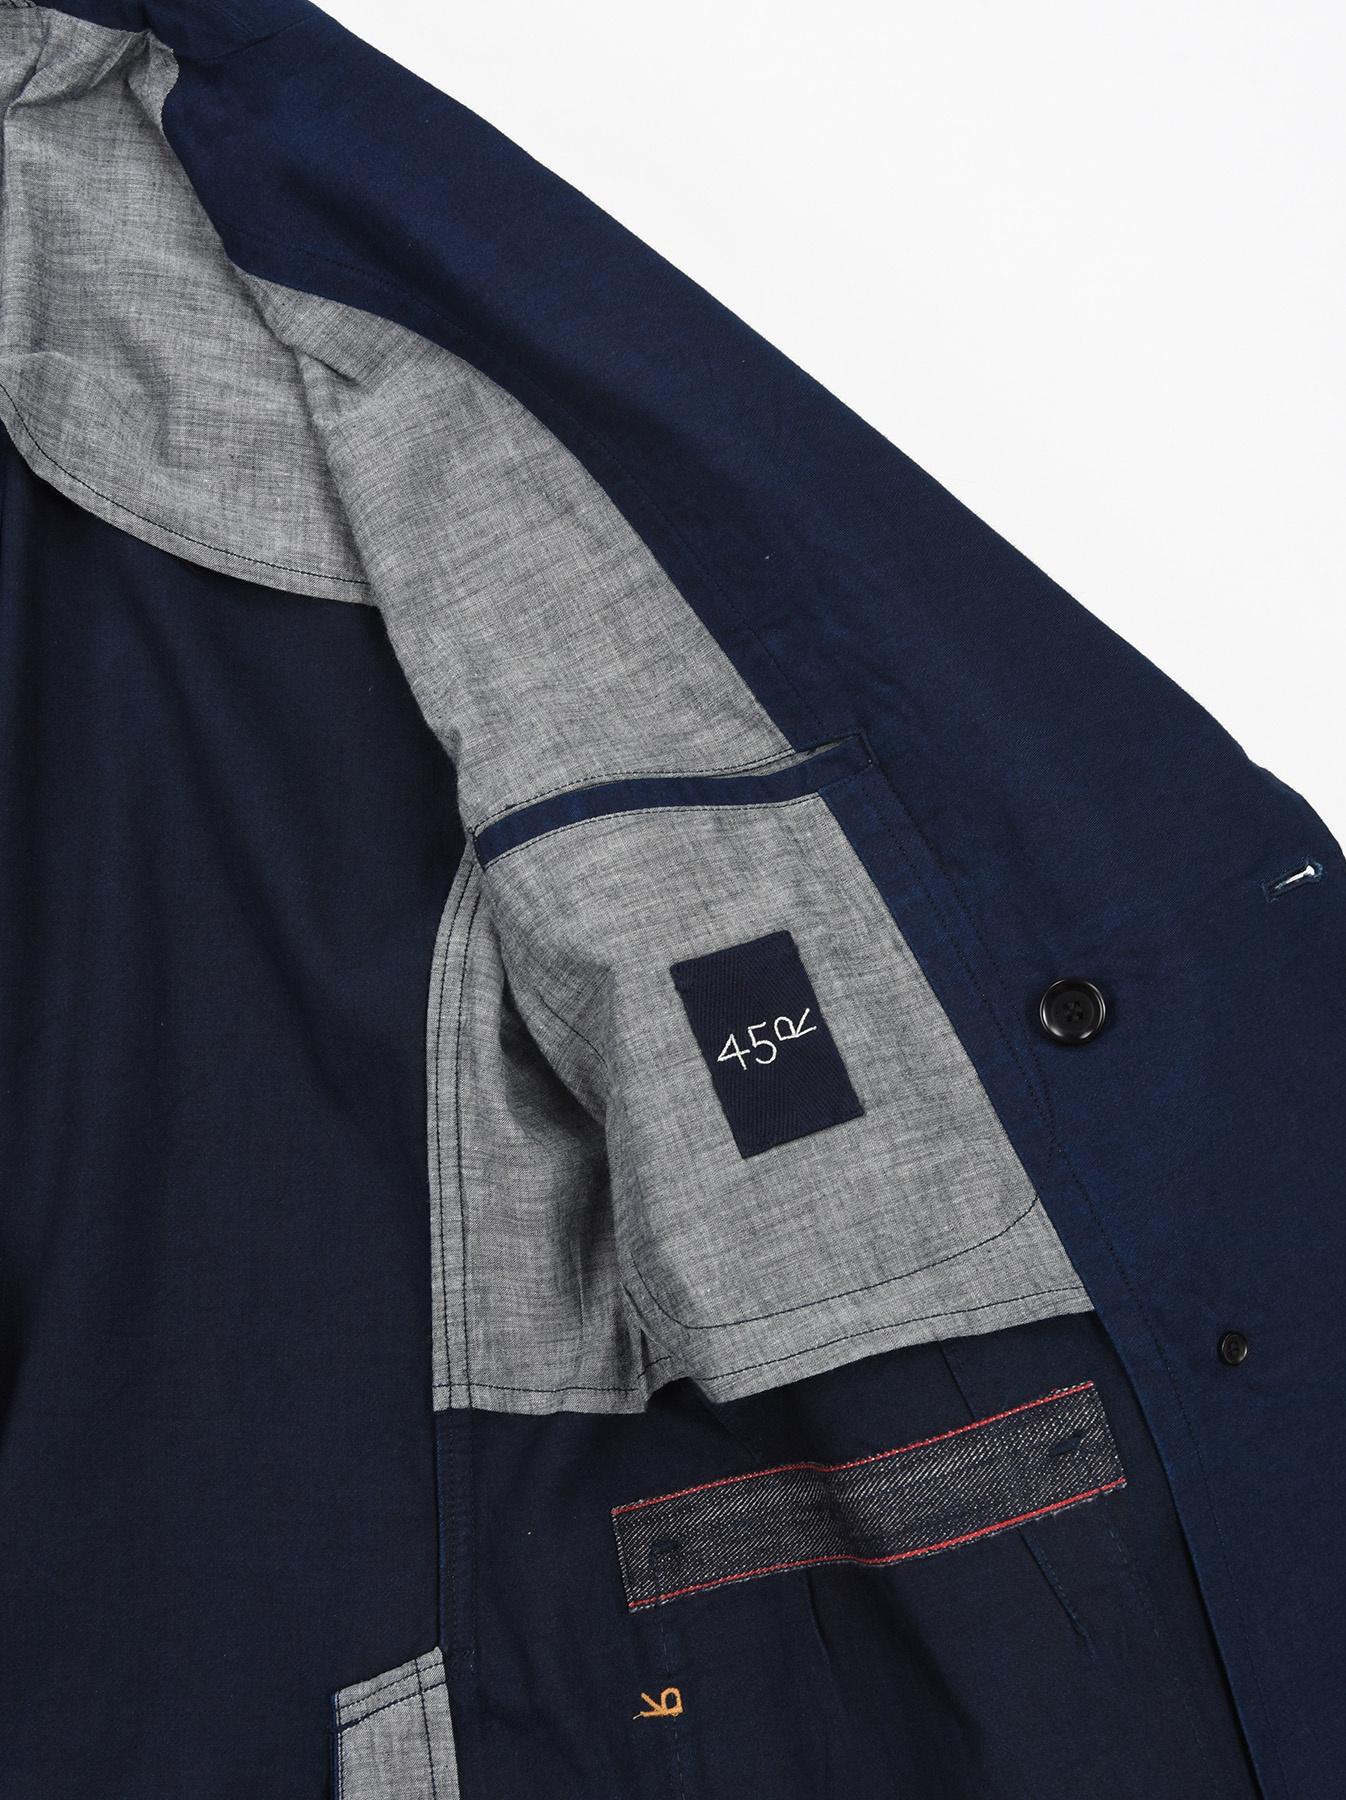 Indigo Mugi Yoko-shusi Soroe Double Breasted Jacket-10